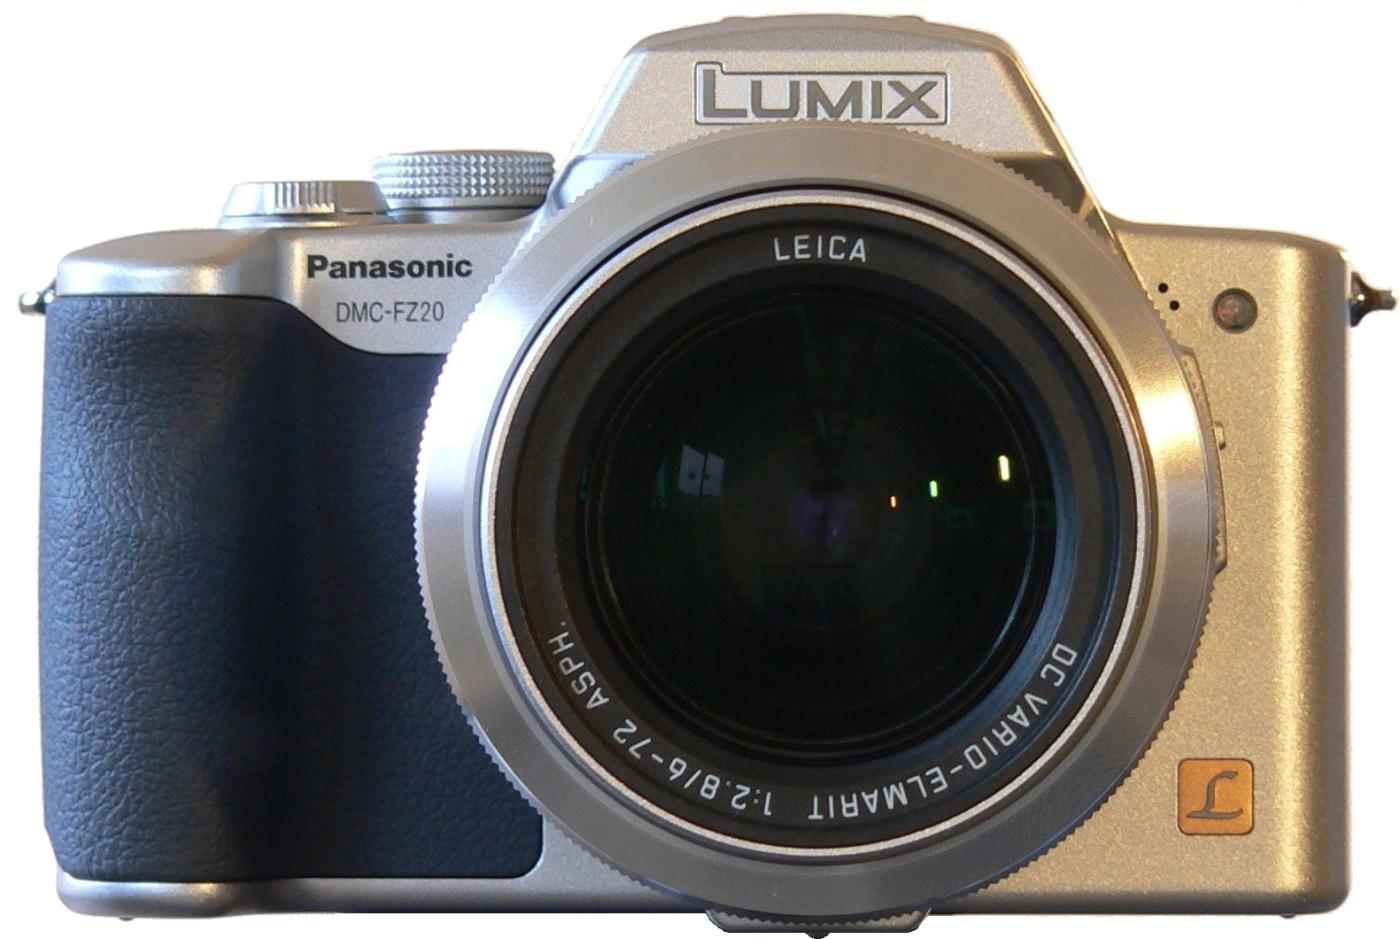 Panasonic Lumix DMC-LZ20